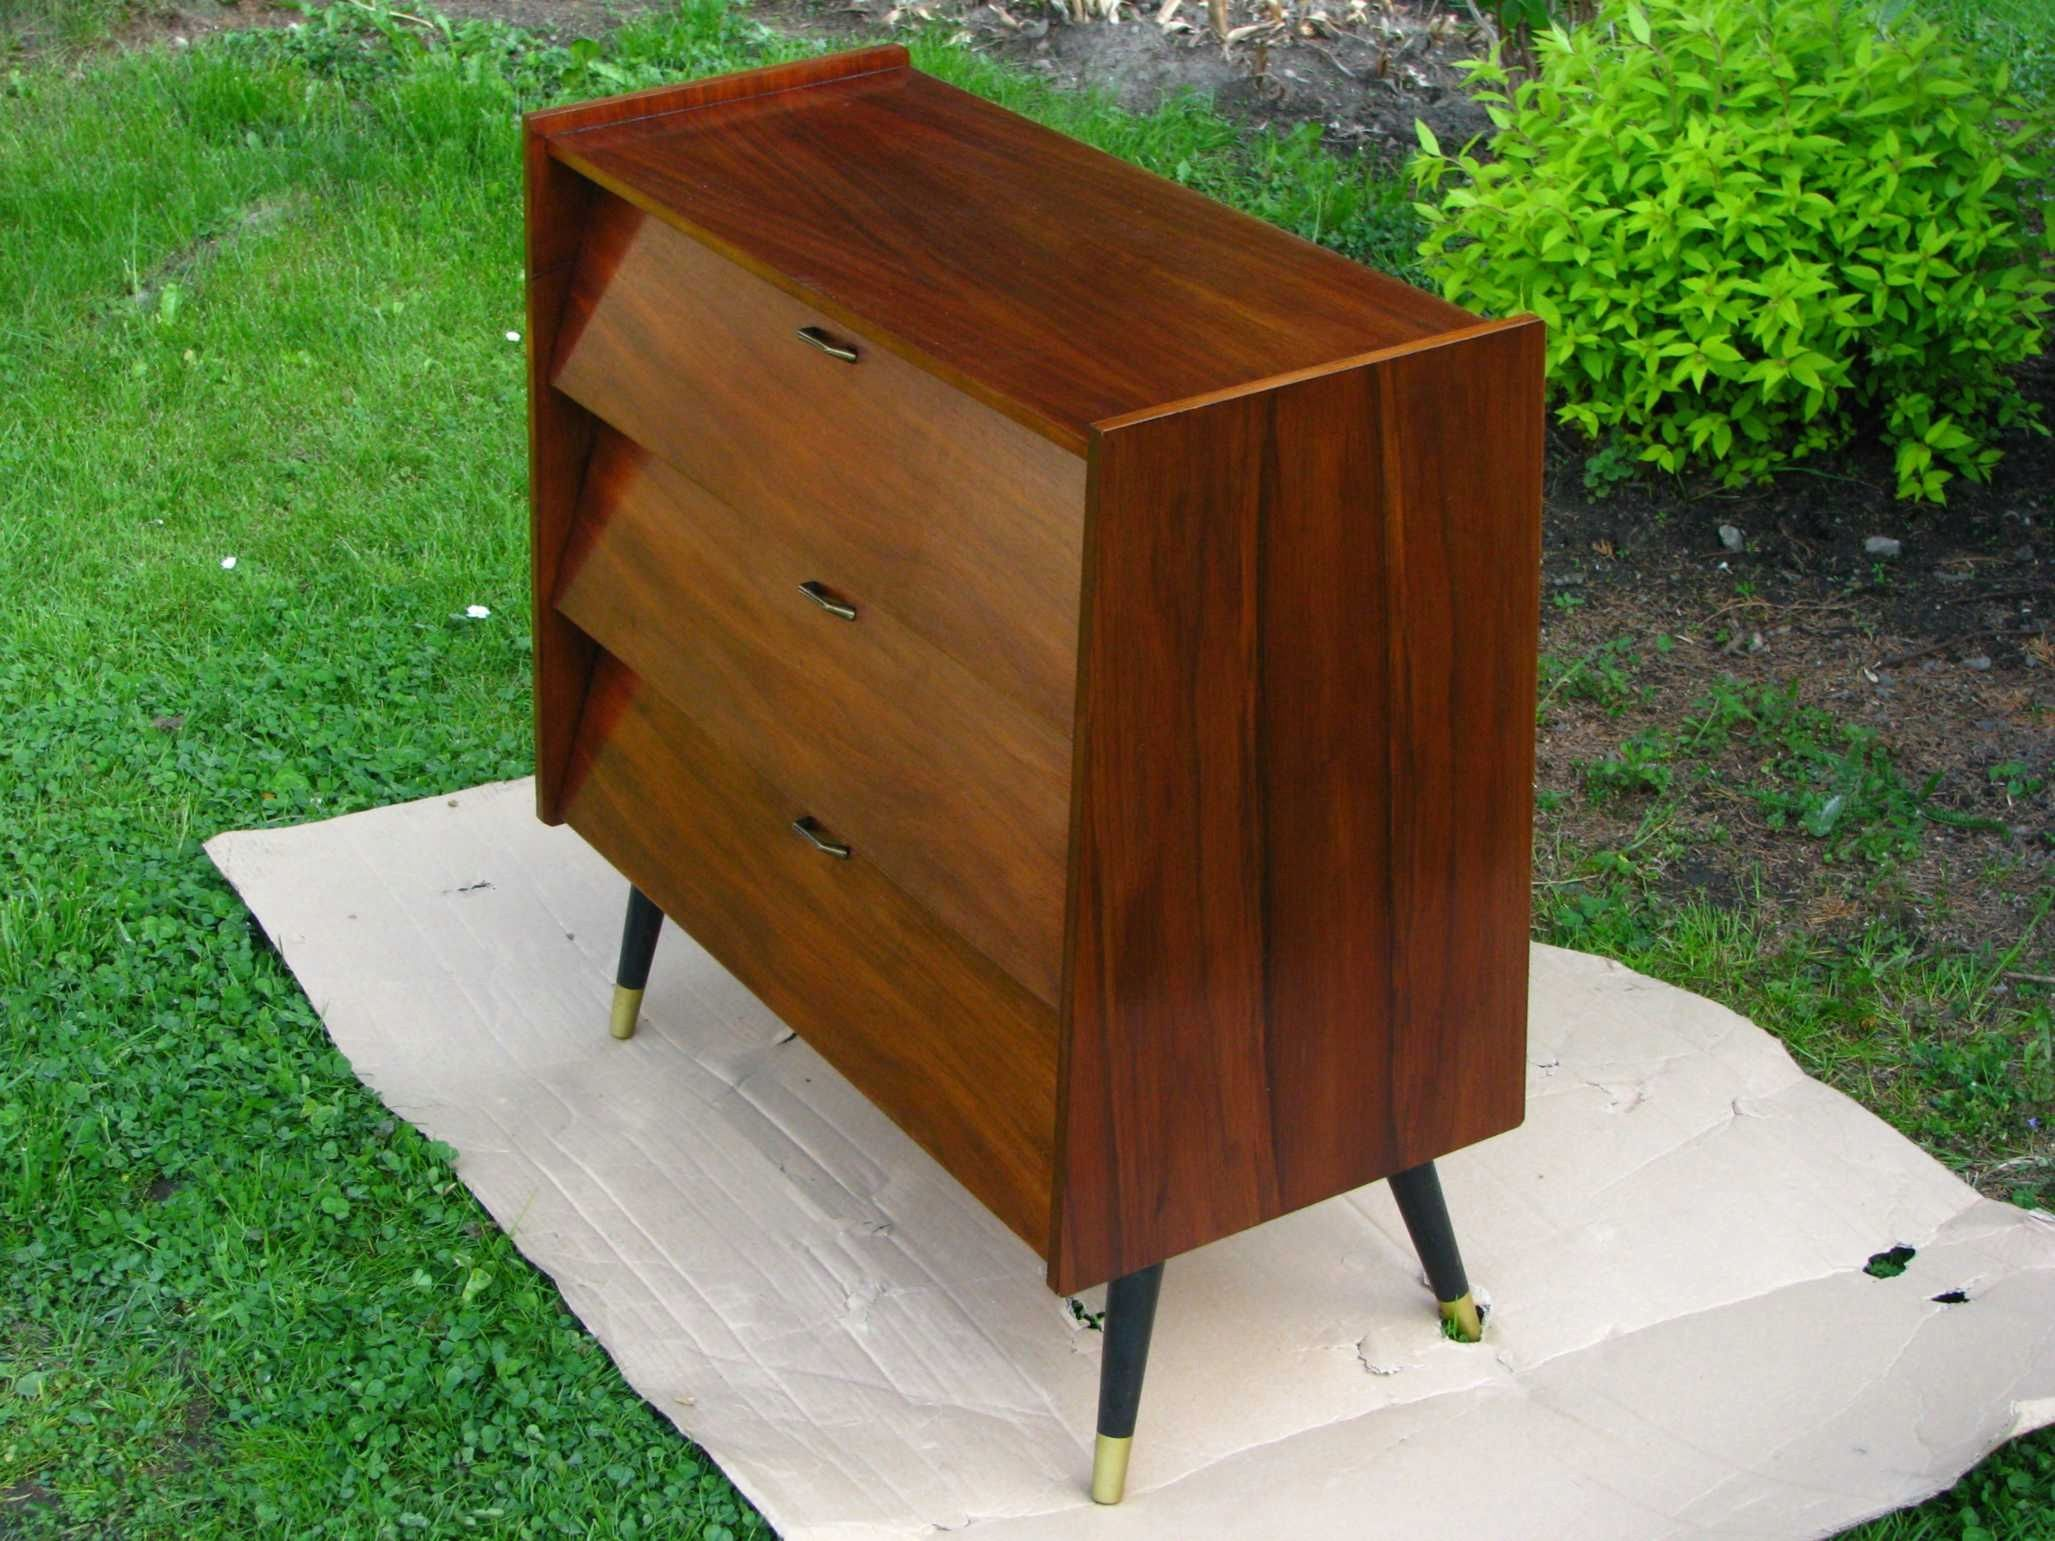 Szafka Na Buty Komoda Vintage Lata 60 70 Design 8113602599 Oficjalne Archiwum Allegro Decor Home Decor Furniture